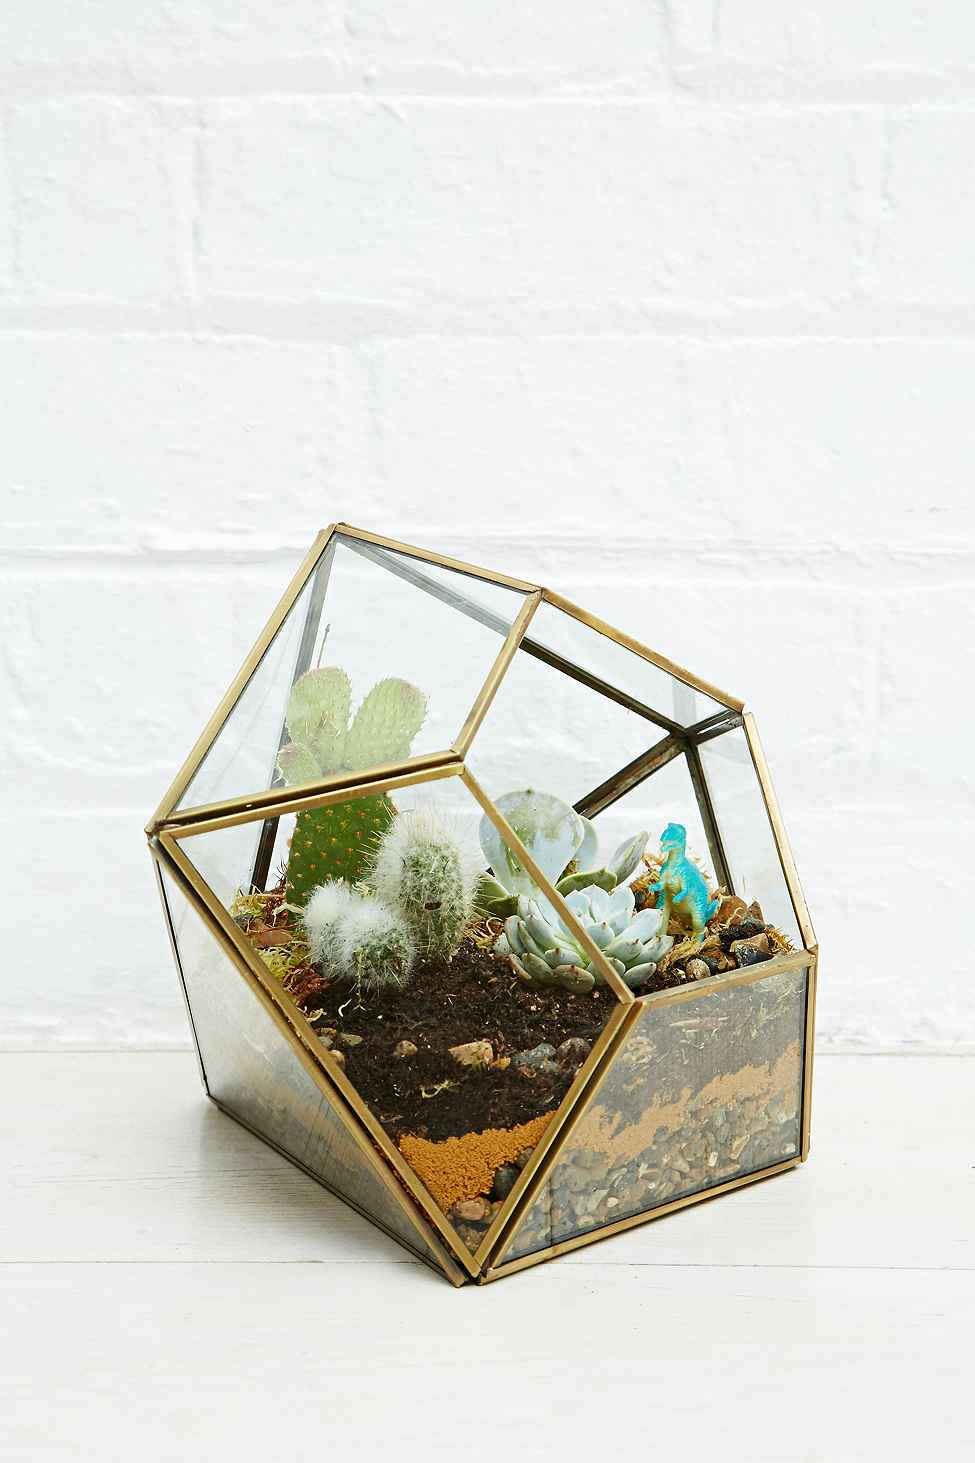 terrarium en verre geometrique dore deco interieure plante verte cactus. Black Bedroom Furniture Sets. Home Design Ideas